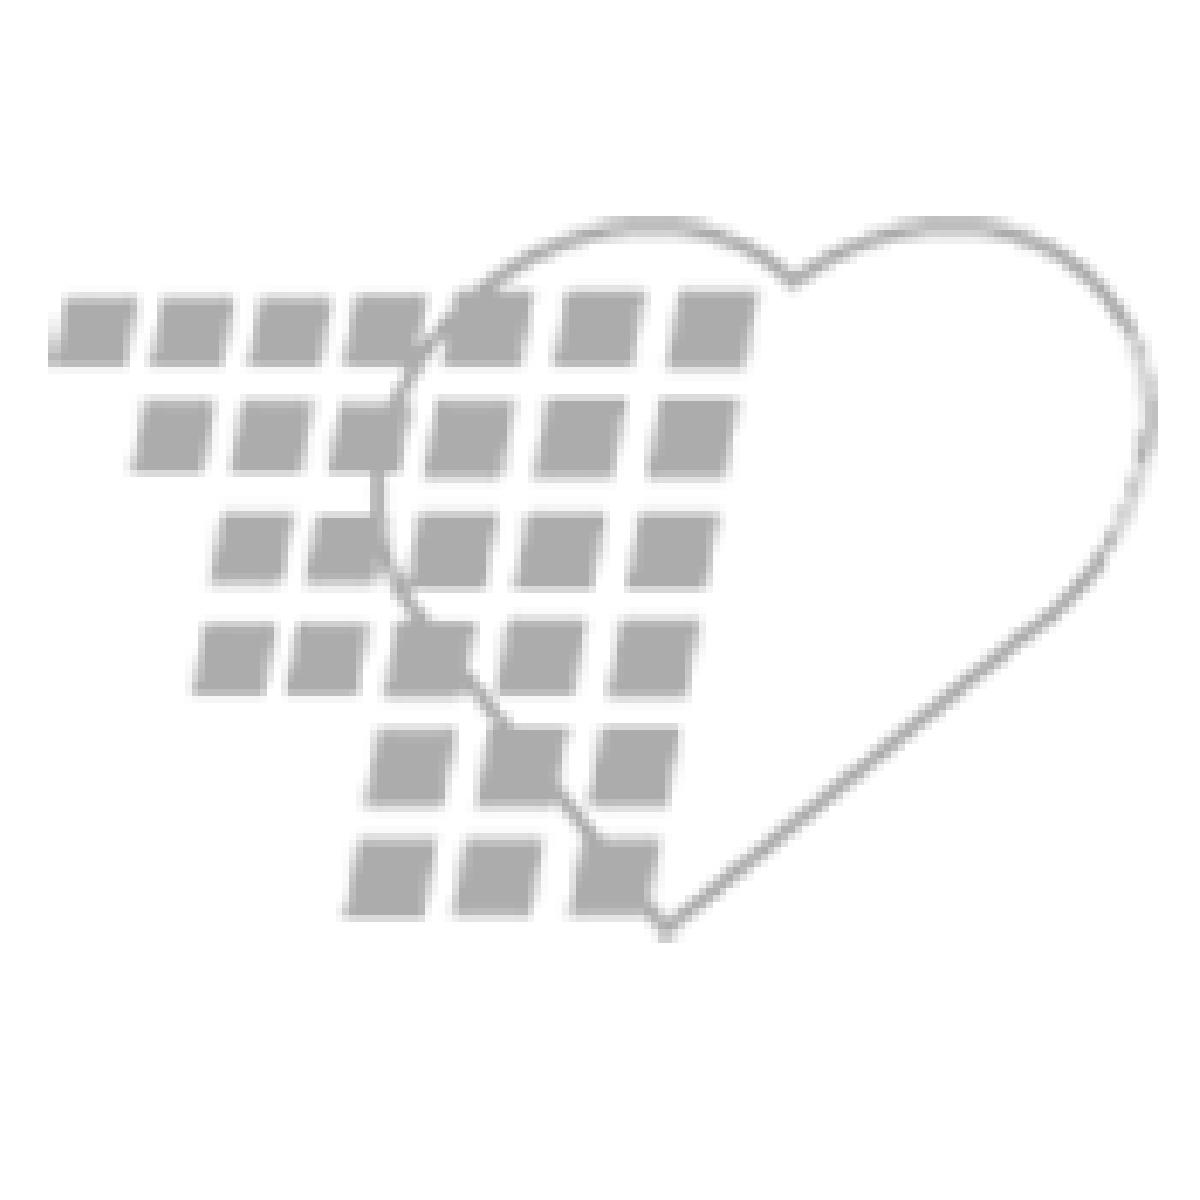 06-93-6948 Demo Dose® EPINEPHrin (Adrenalin) Injection 30mL 1mg/mL